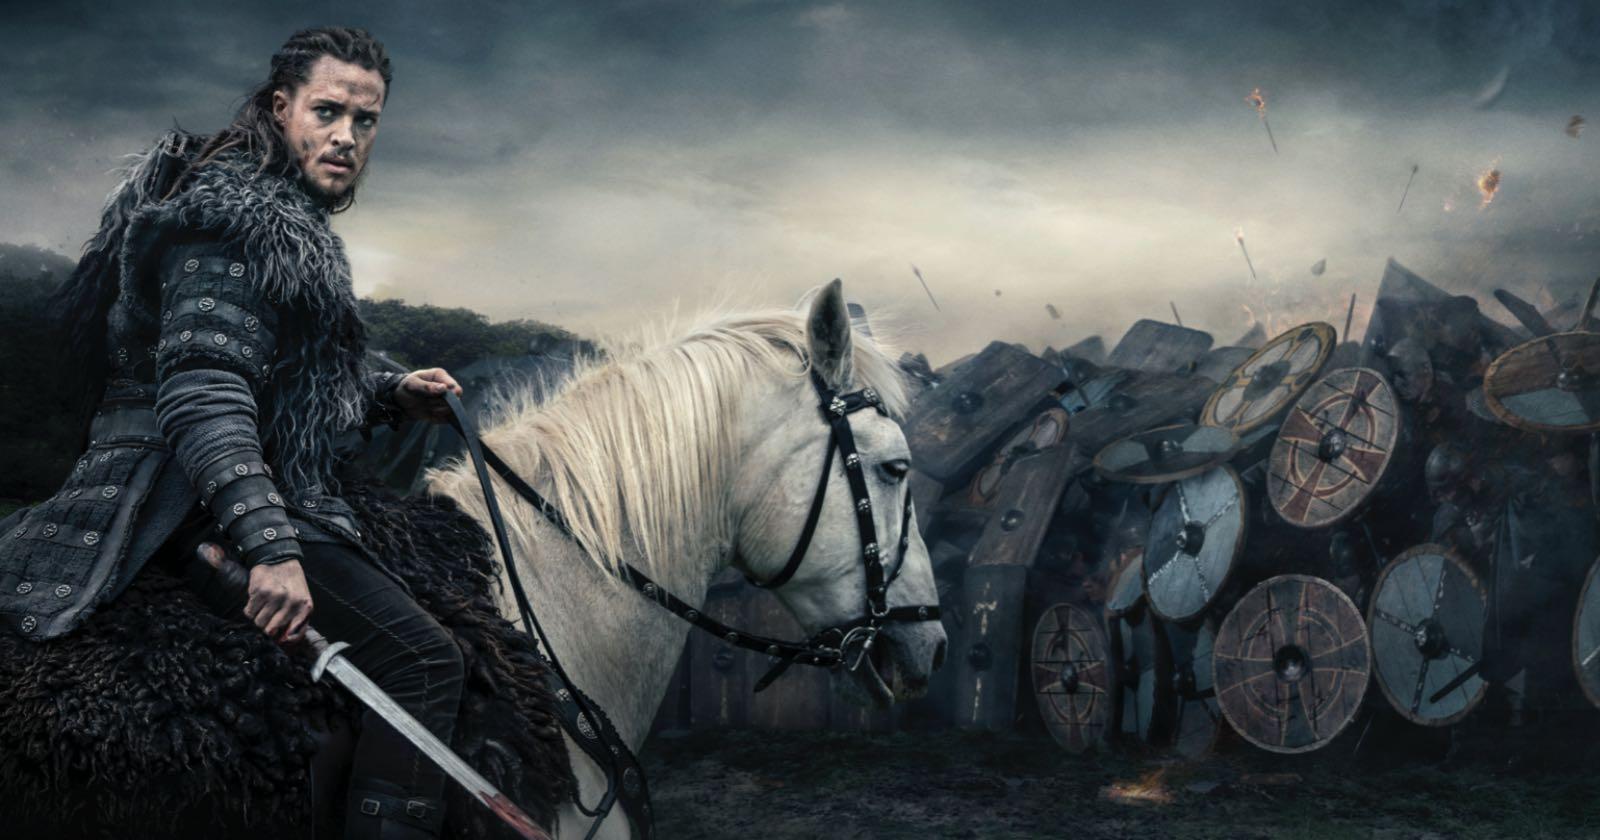 Escena característica de la serie The Last of Kingdom.